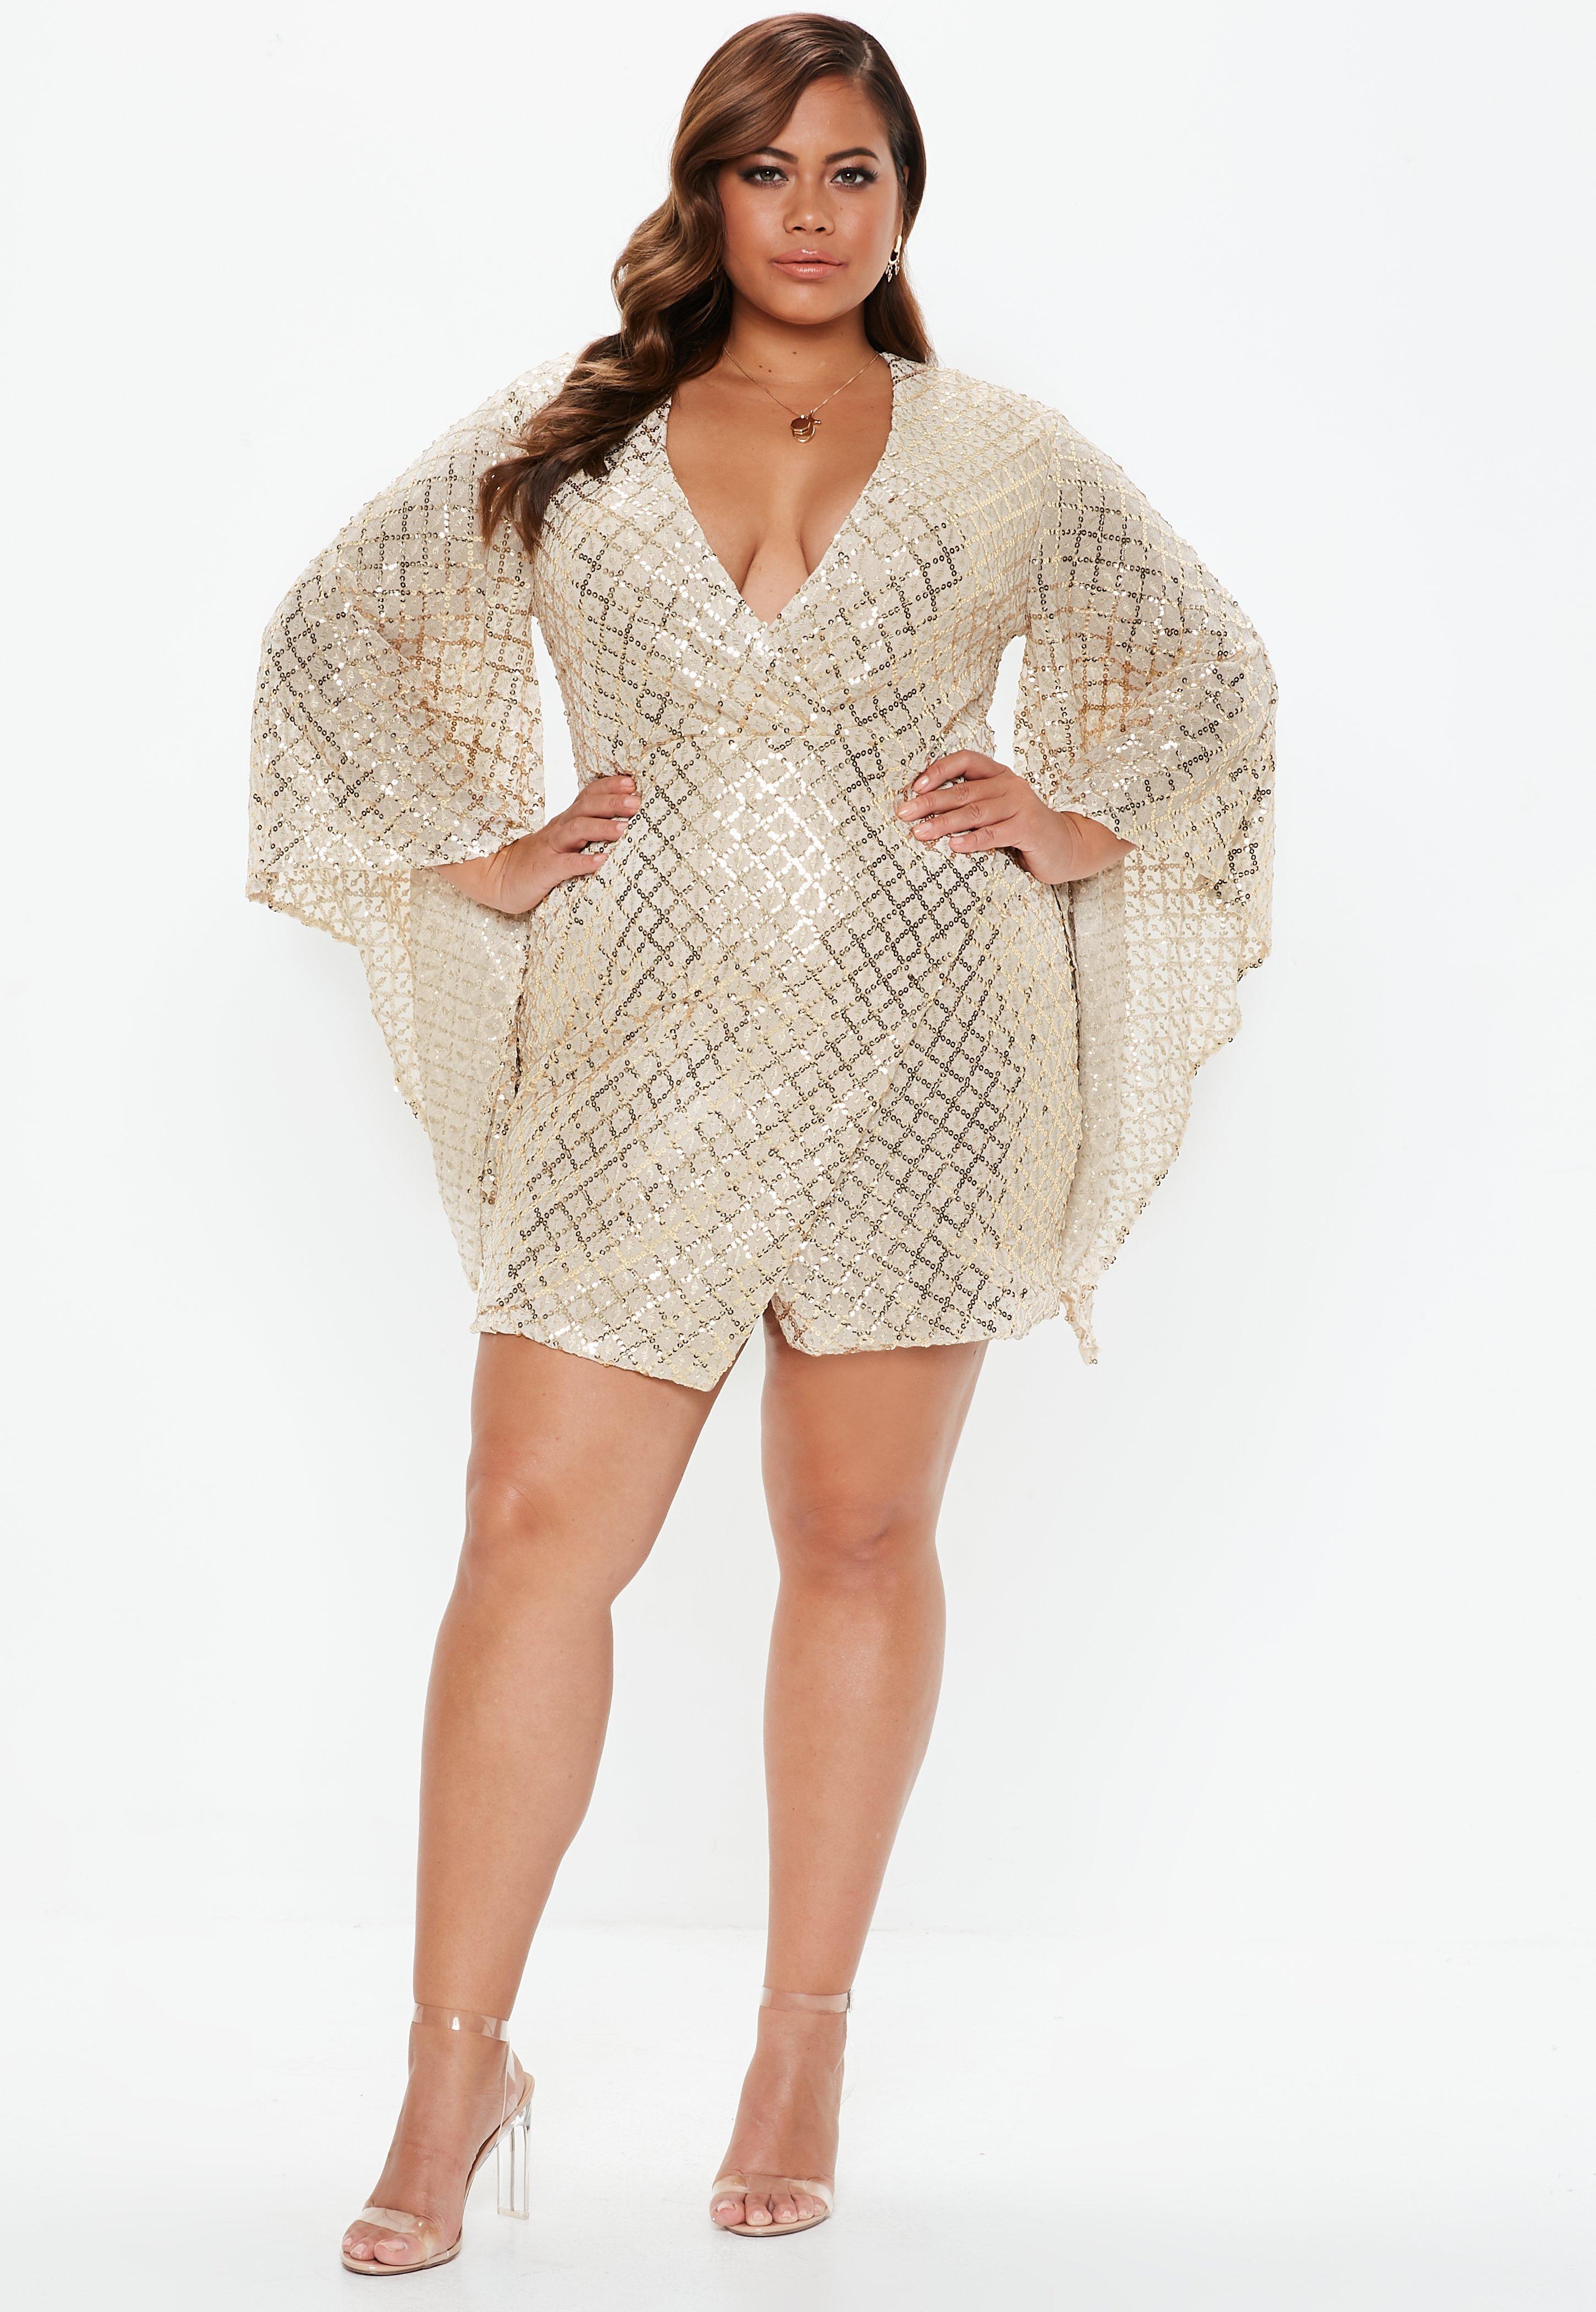 Missguided - Metallic Plus Size Gold Sequin Wrap Mini Dress - Lyst. View  fullscreen 17a742e24